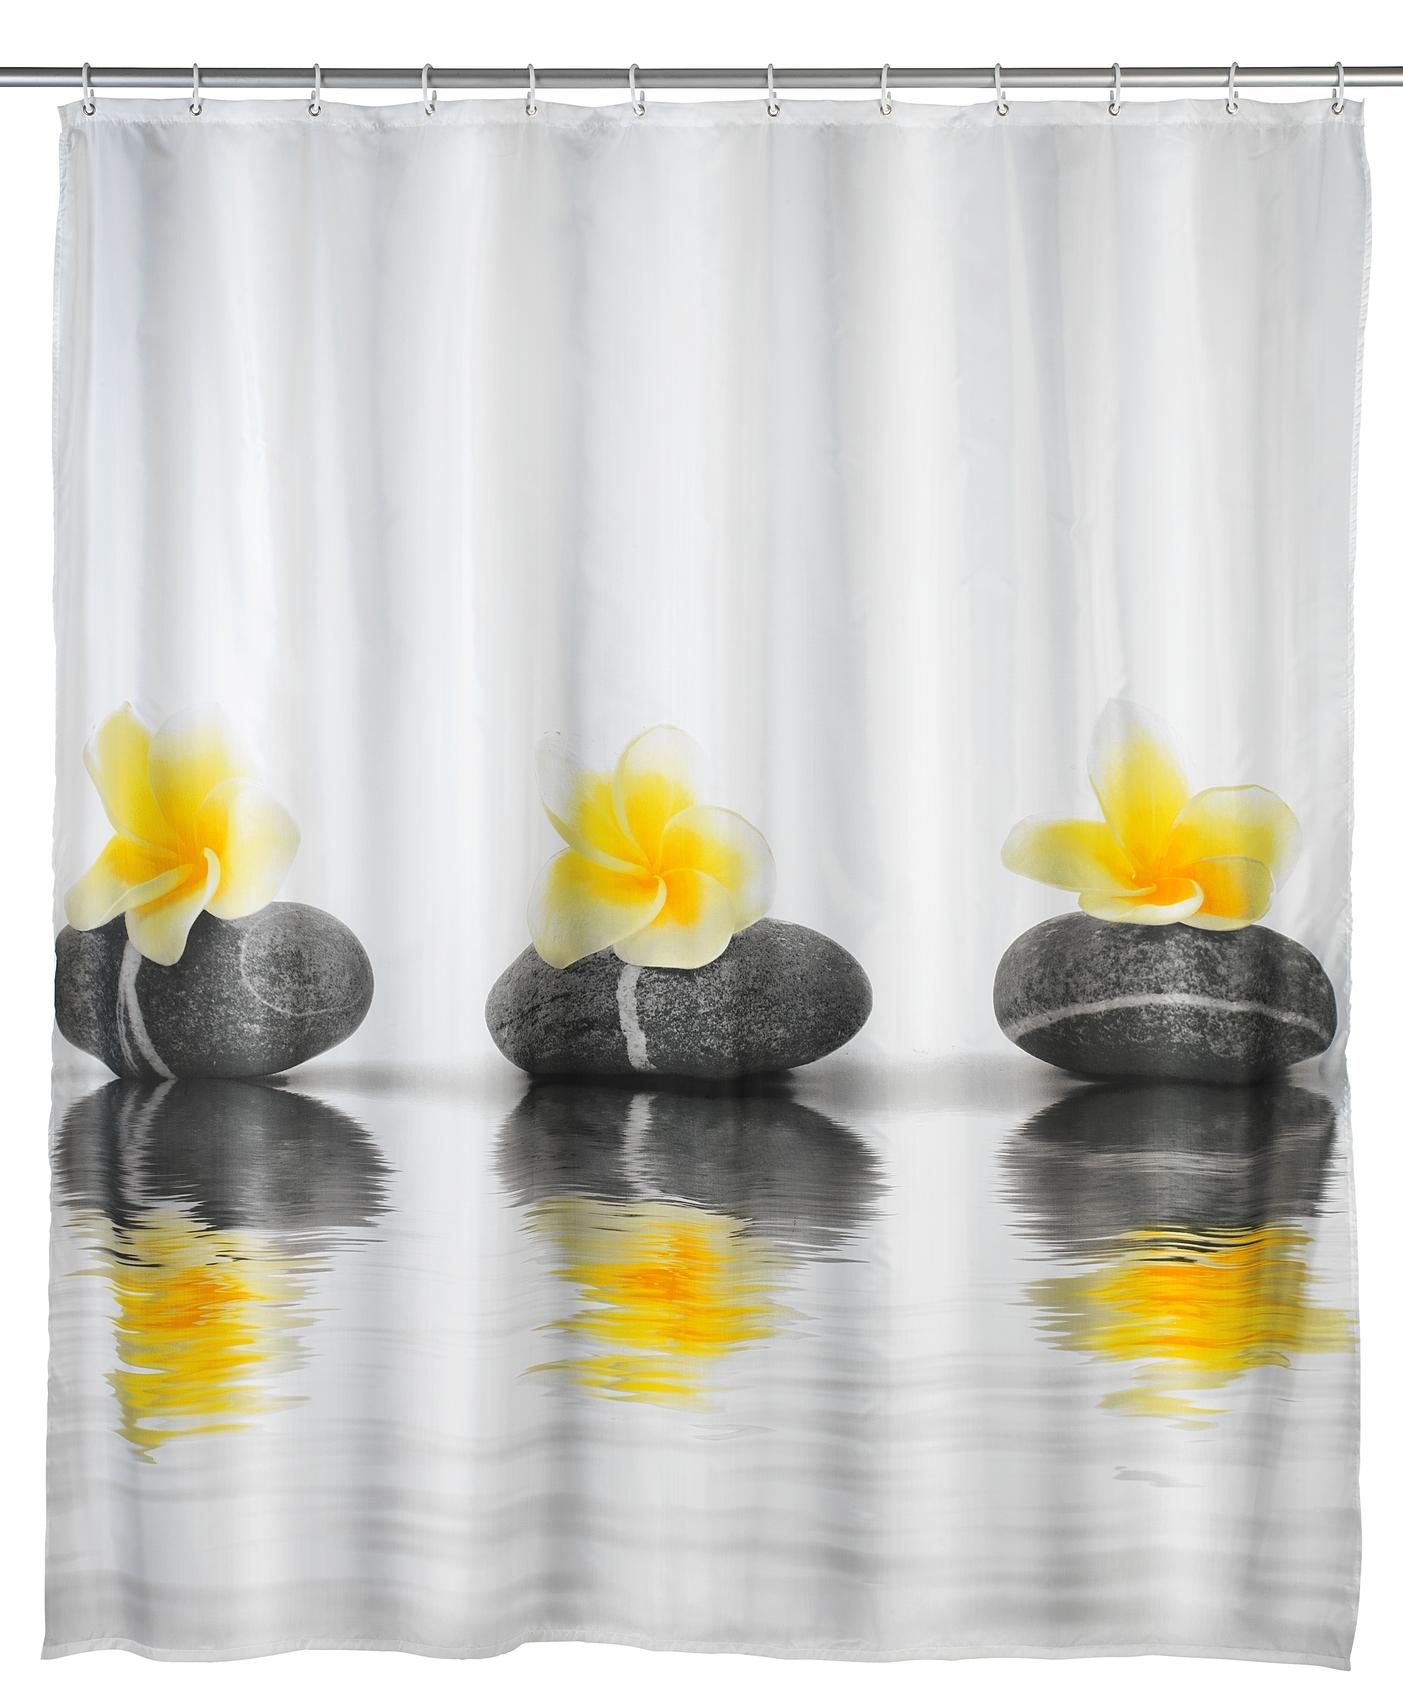 Perdea dus din poliester, Stones and Flower Alb, 180 x 200 cm